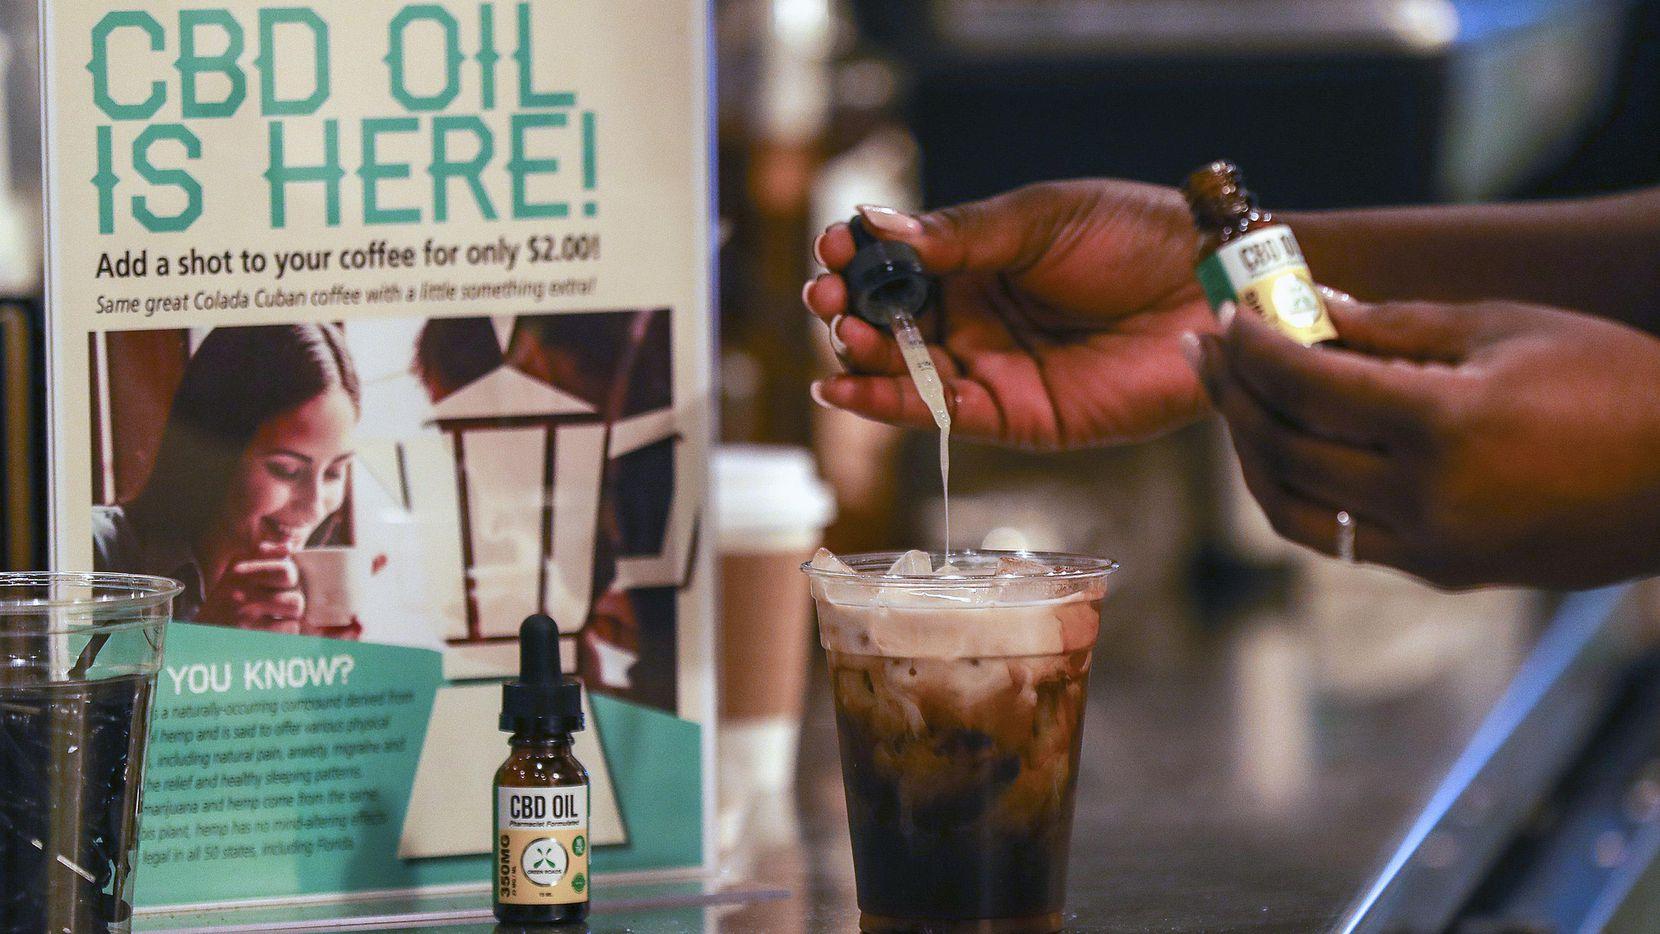 Una persona agrega gotas del compuesto CBD a un café en Fort Lauderdale, Florida. (AP/Jennifer Lett)